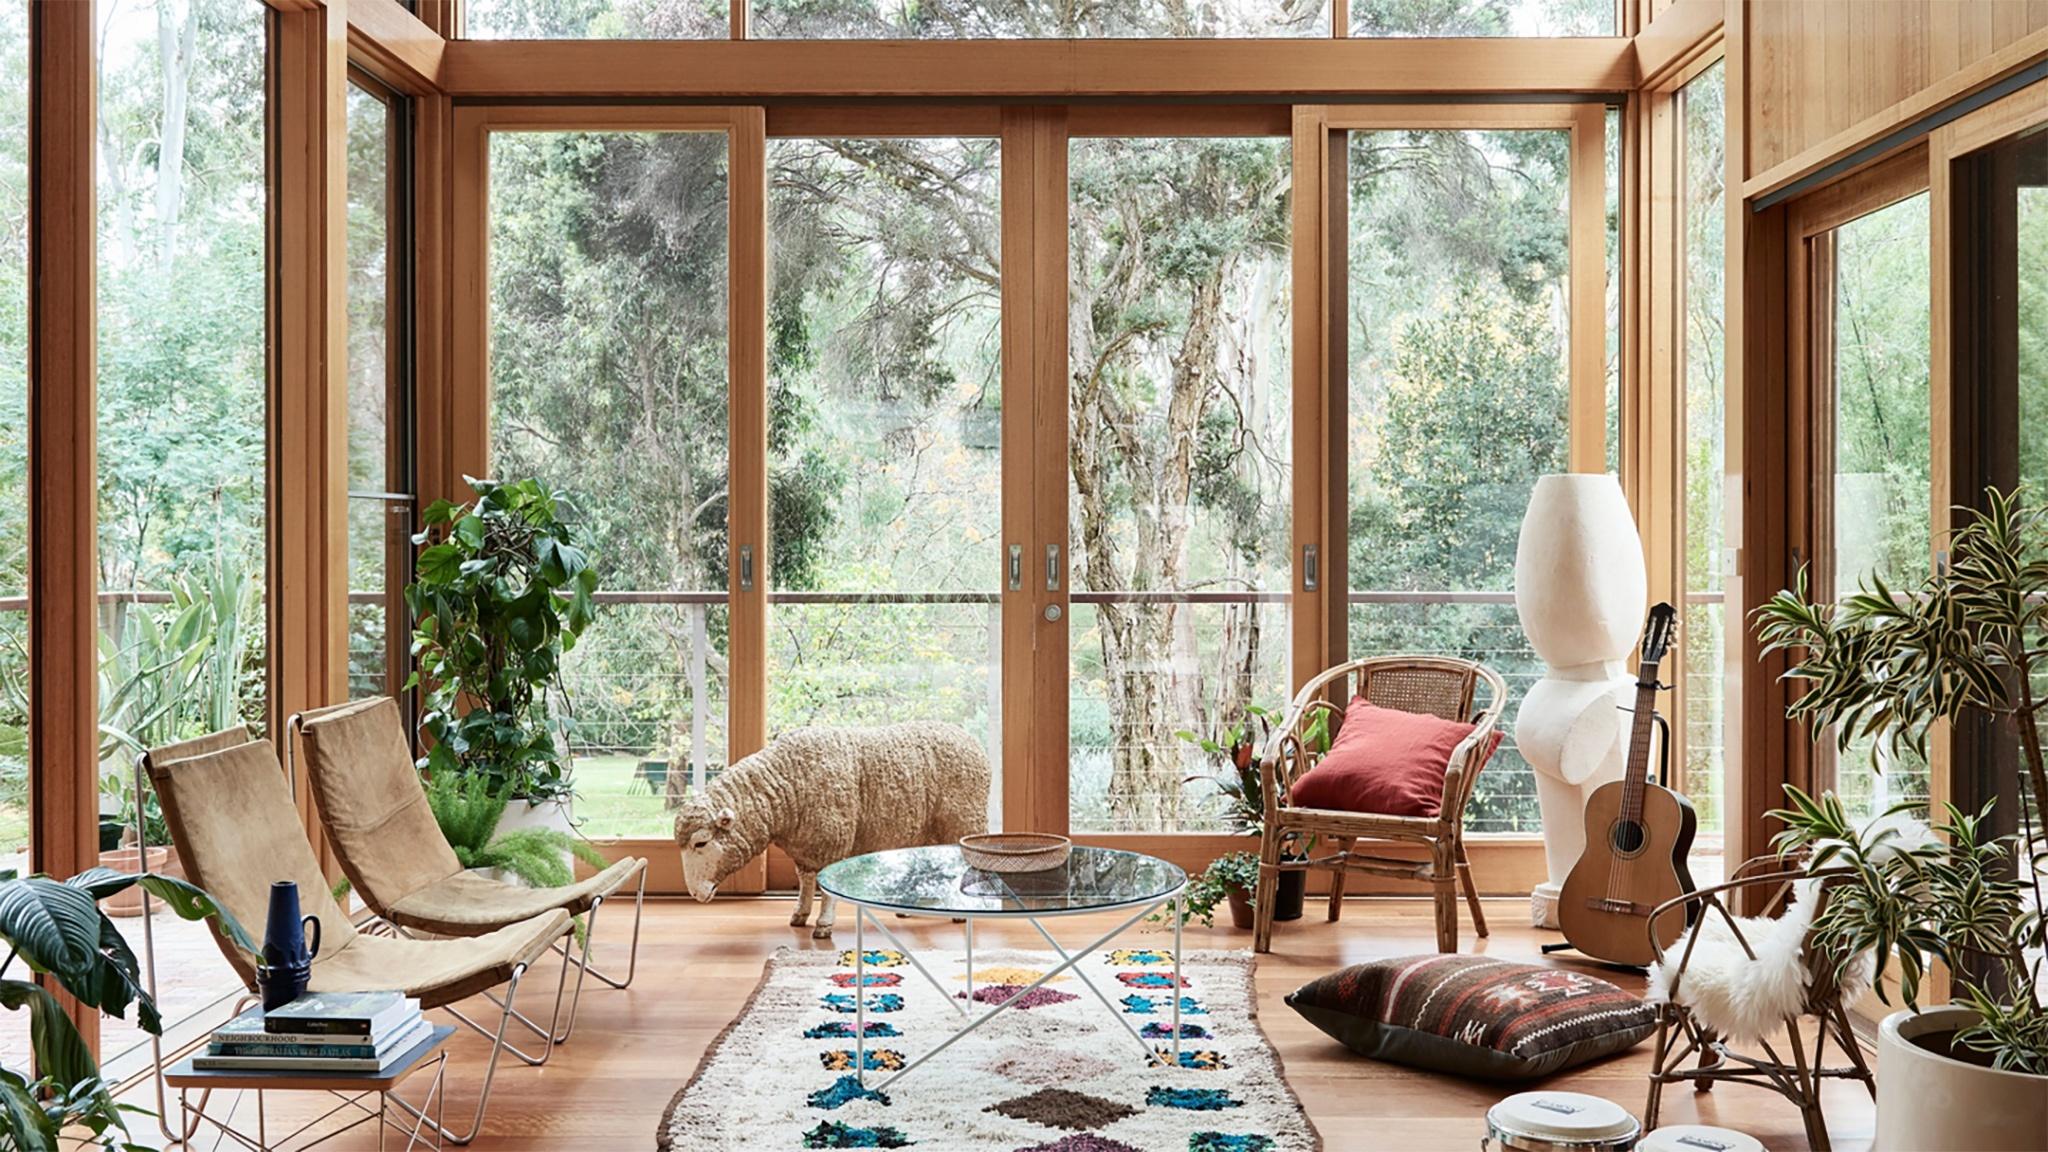 sheep-in-lounge